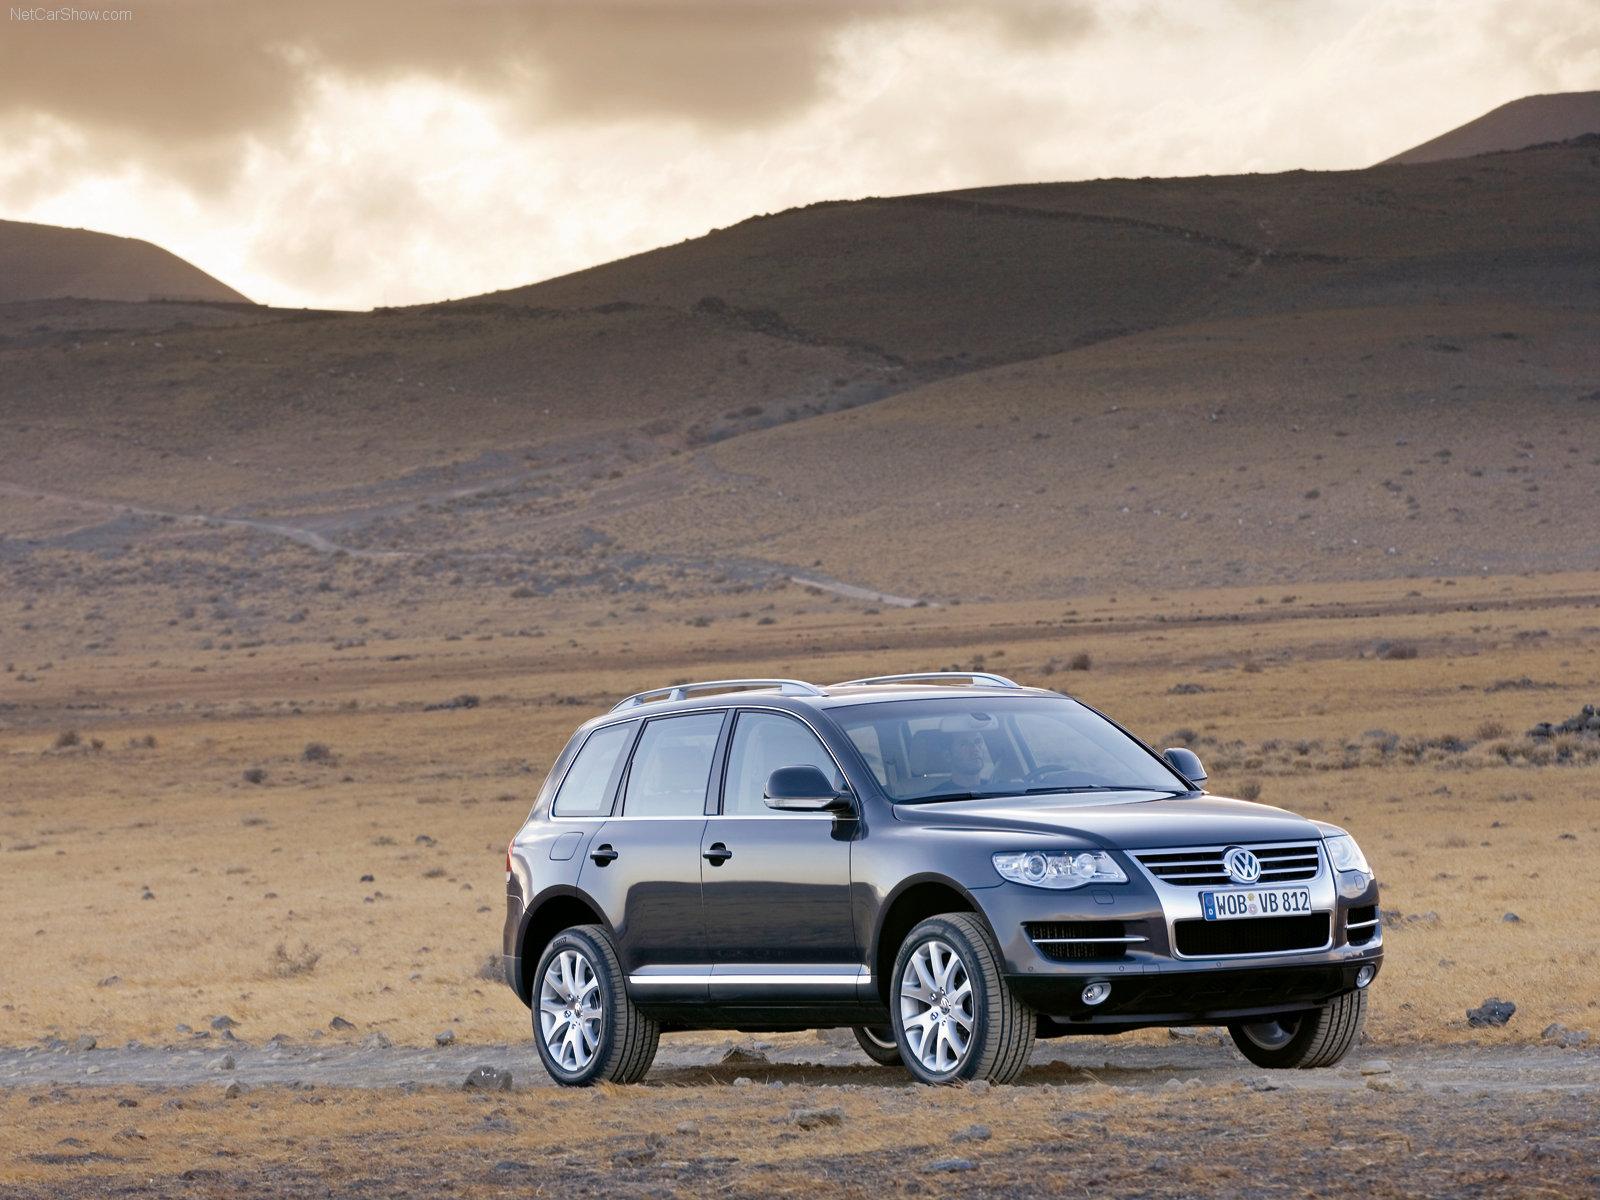 http://w04.ru/foto/Volkswagen-Touareg_2007_1600x1200_wallpaper_08.jpg